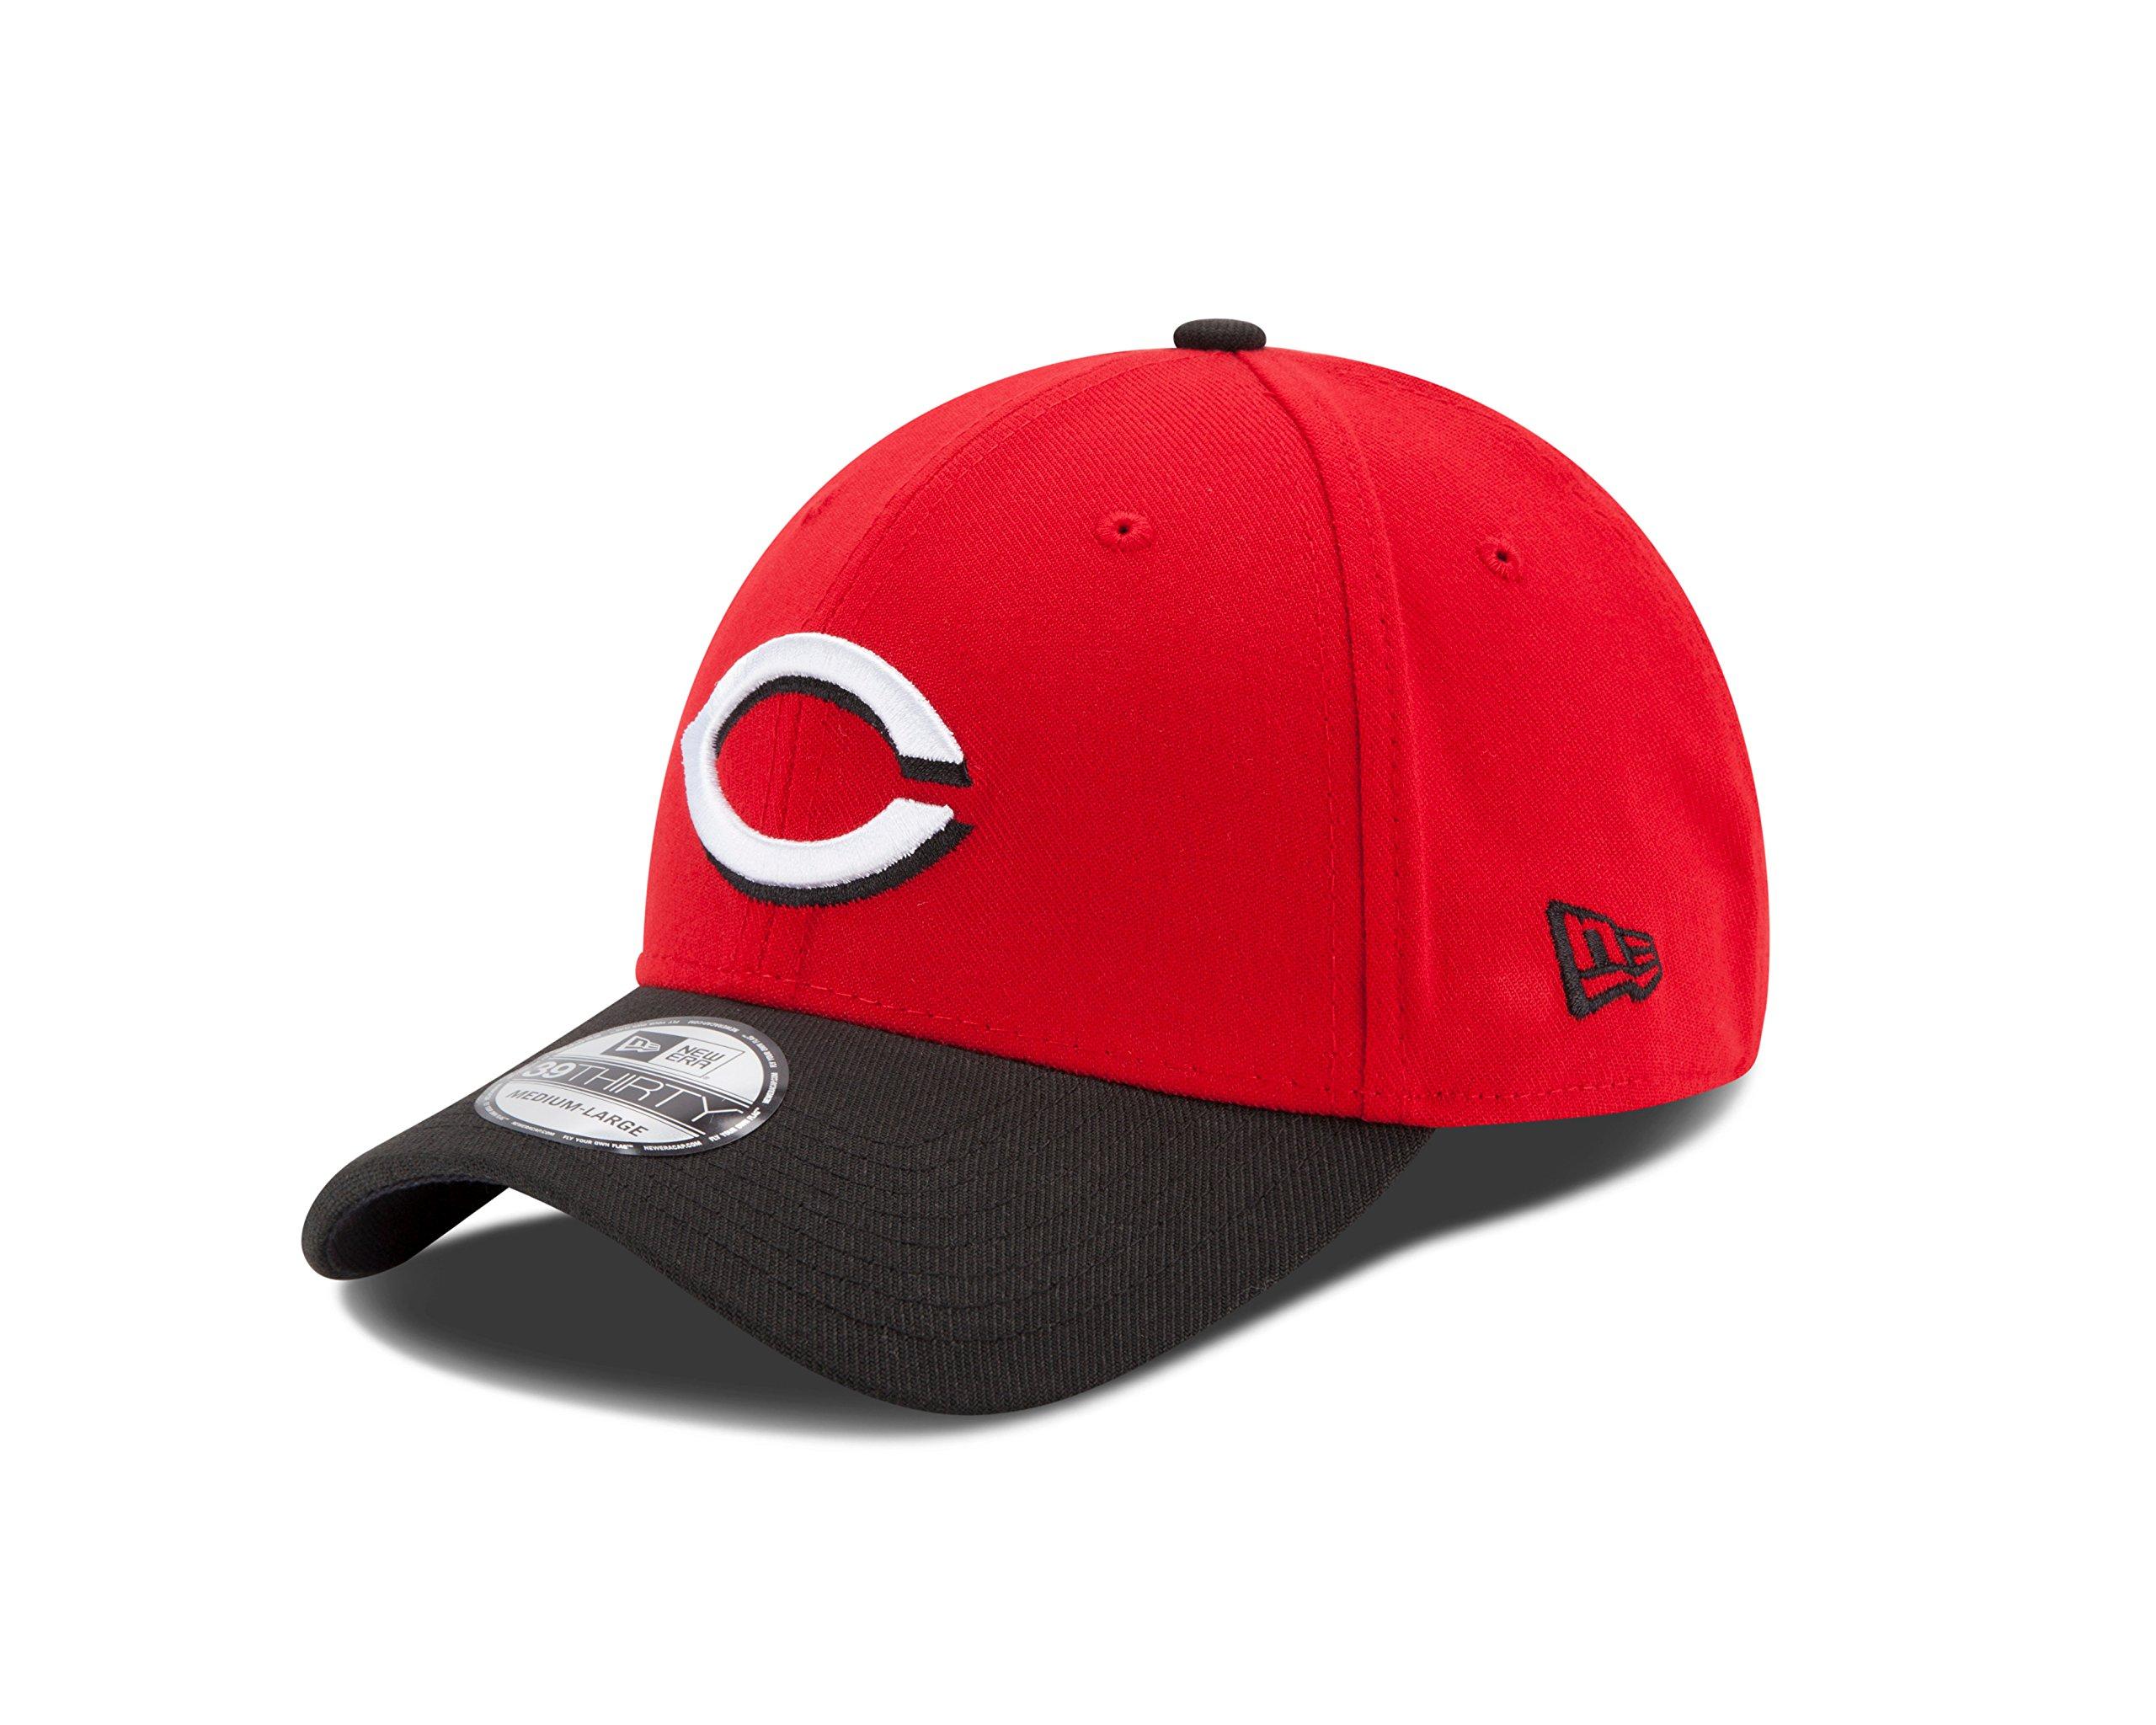 MLB Cincinnati Reds Team Classic Road 39Thirty Stretch Fit Cap, Red, Small/Medium